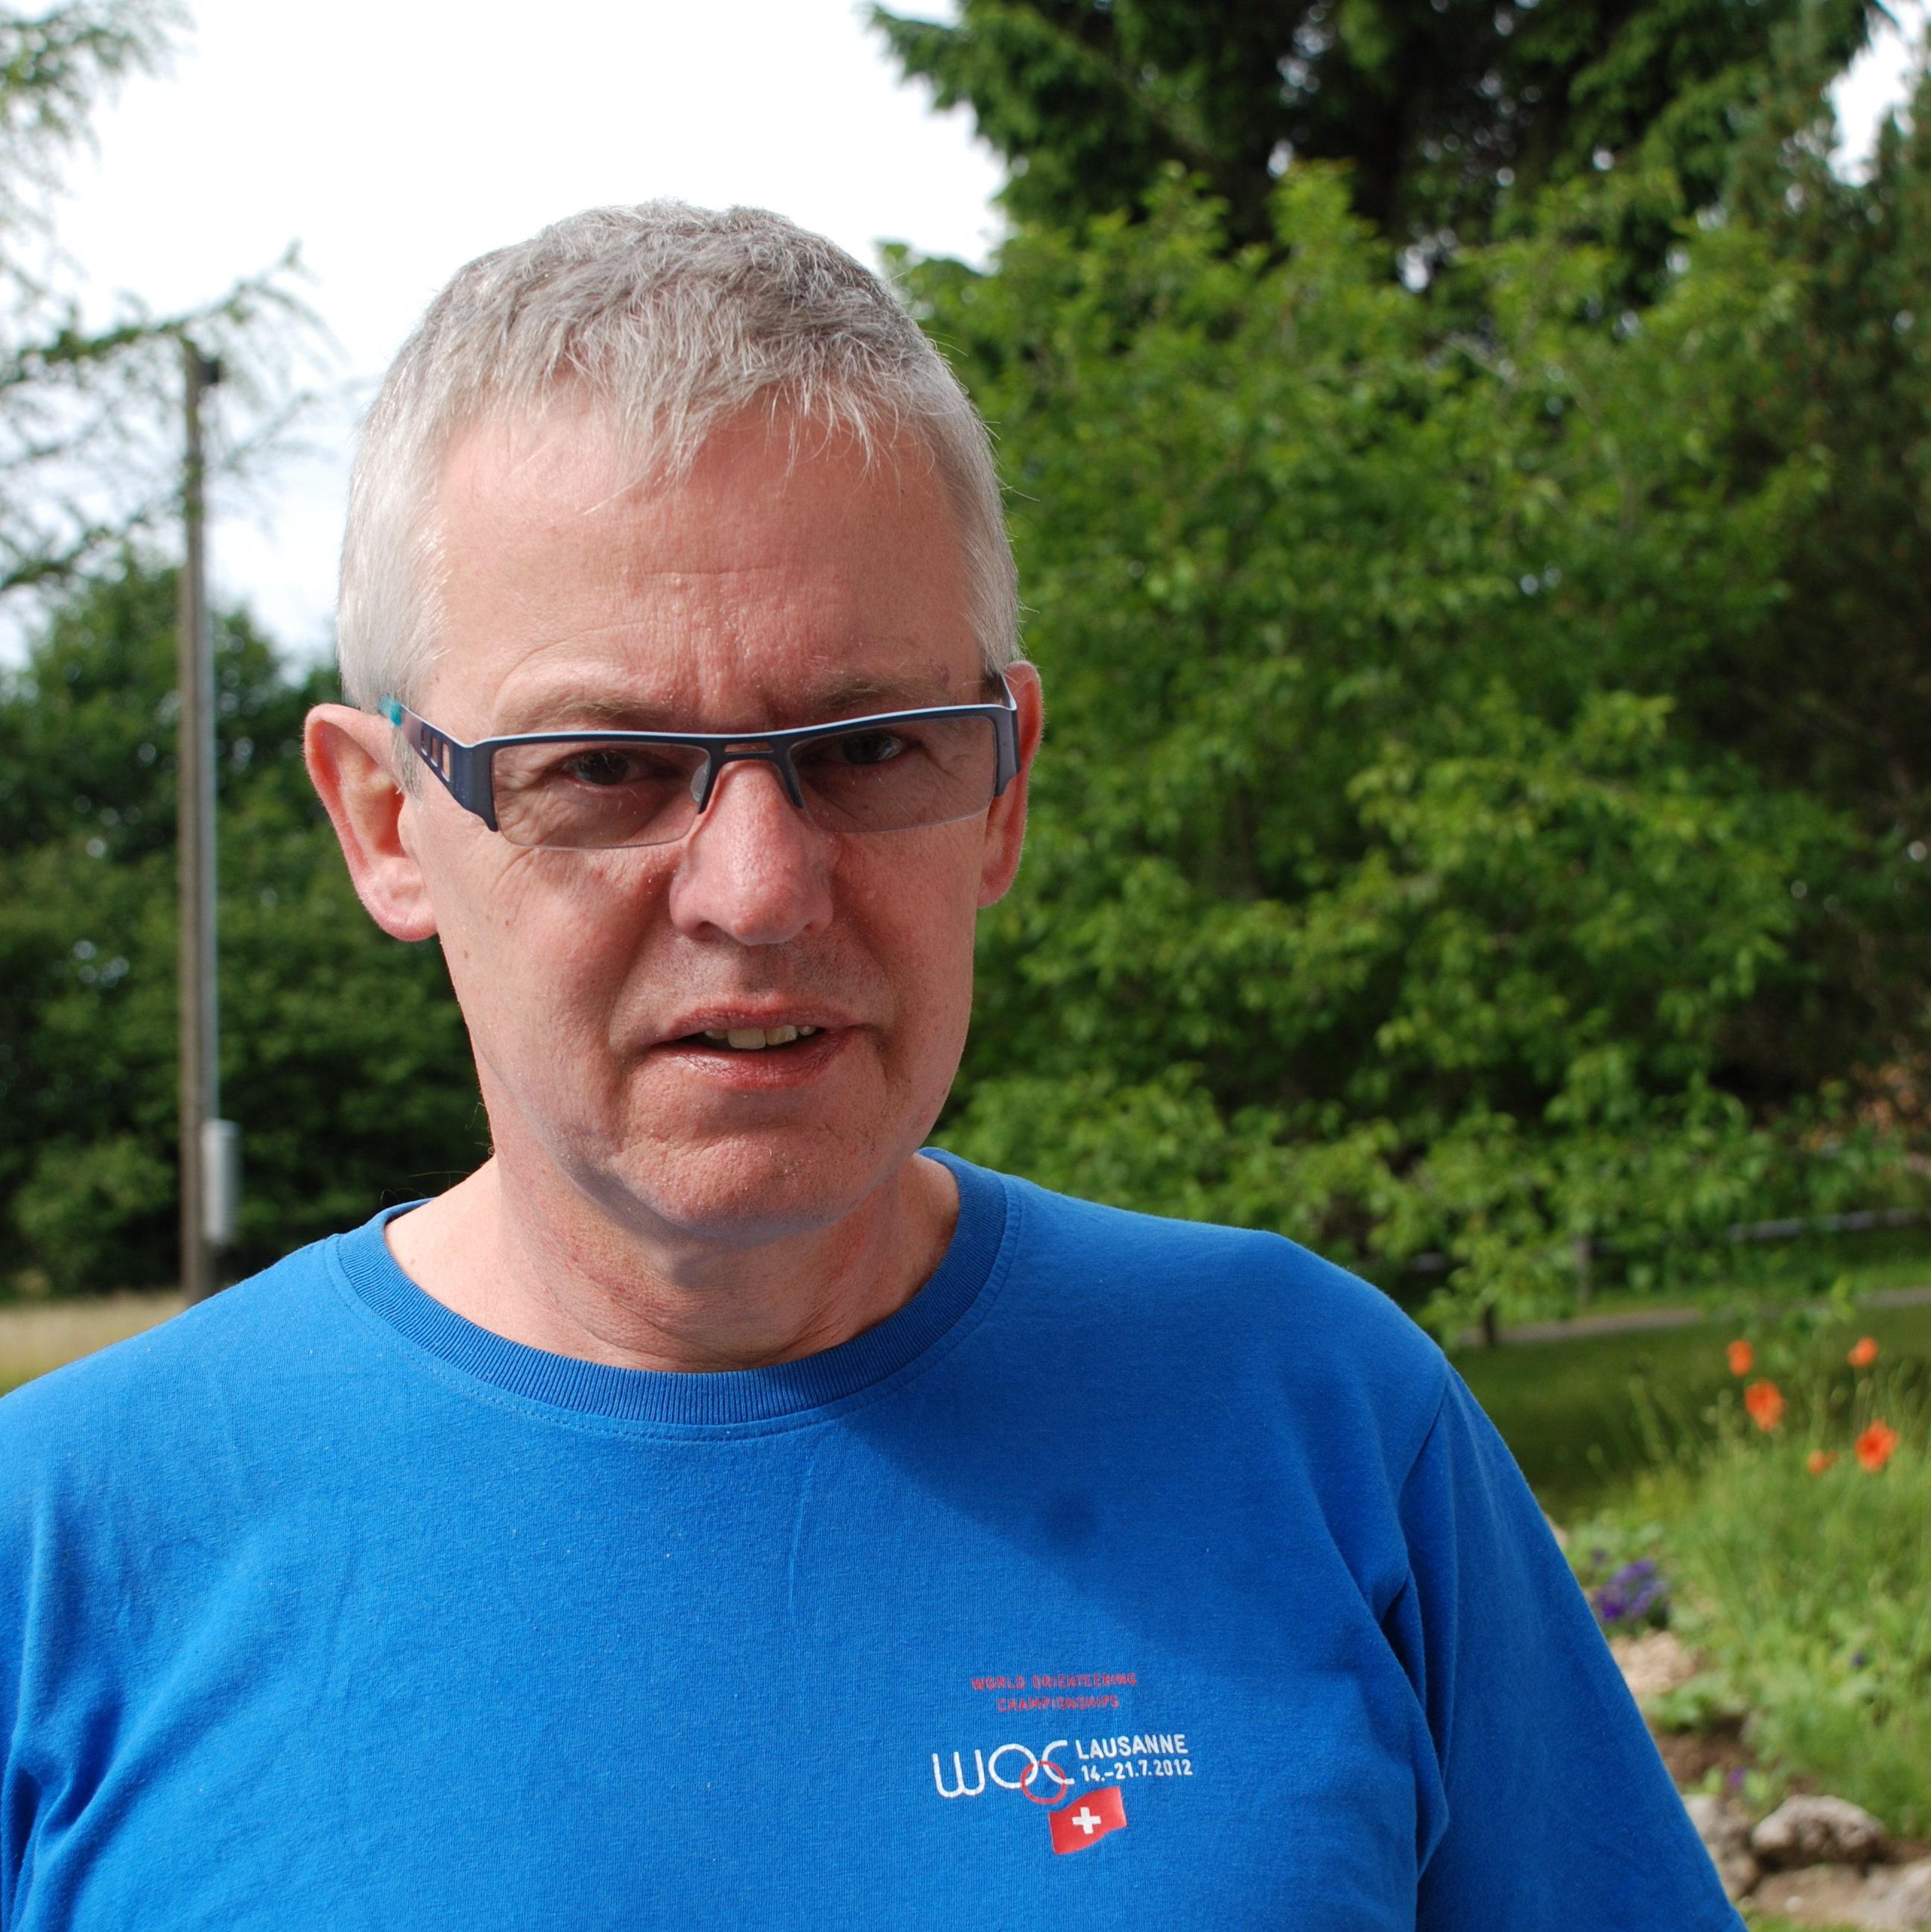 Pierre-Alain Matthey